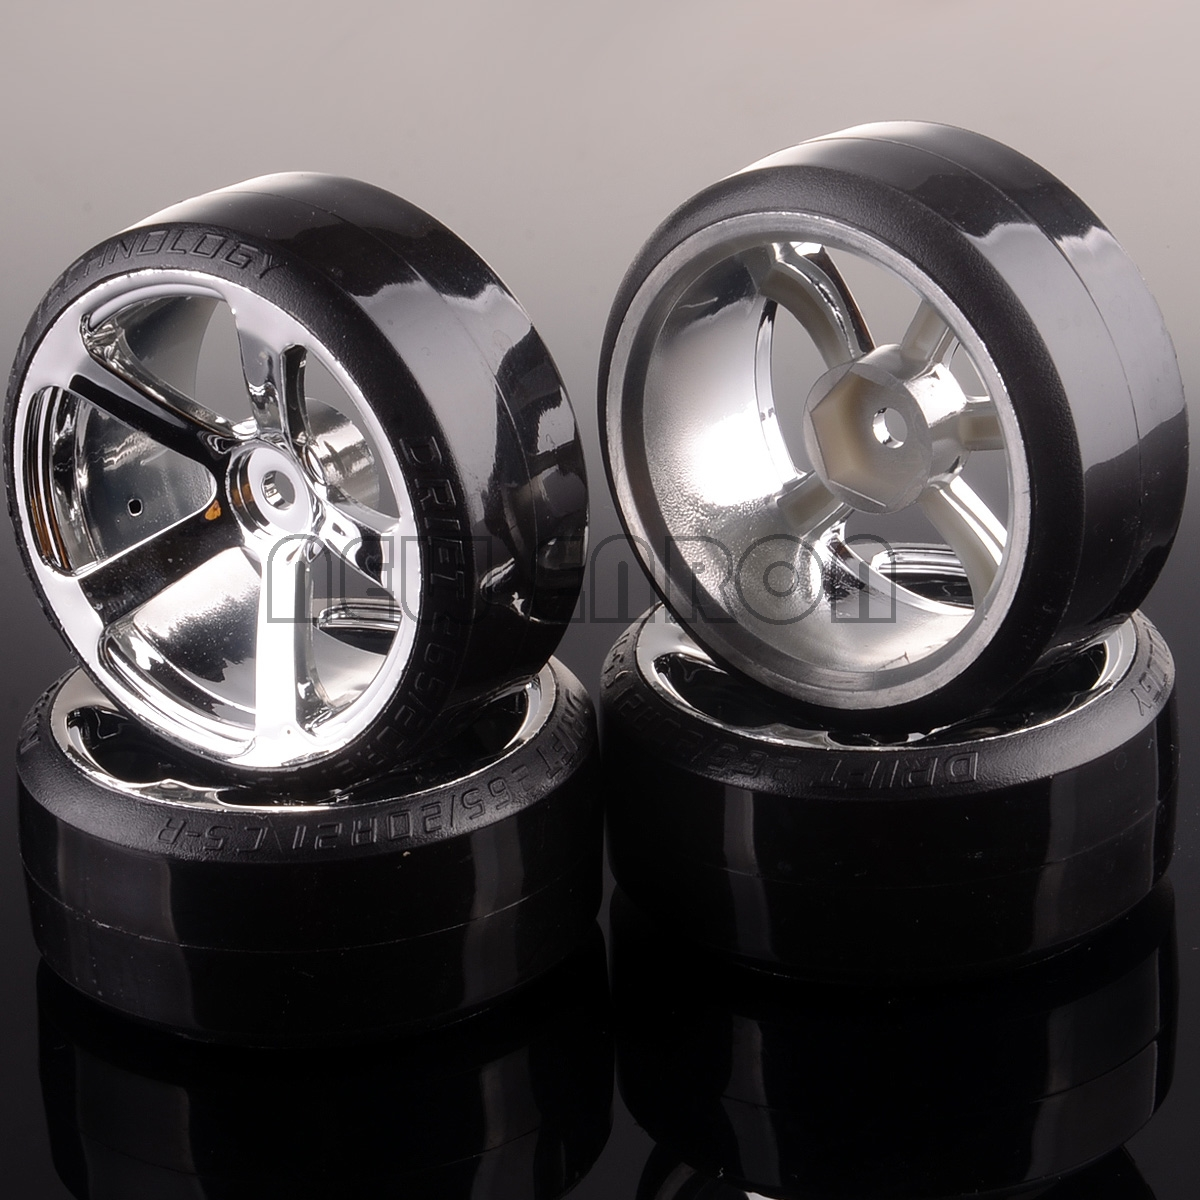 NEW ENRON 4P Plastic Wheel Rim Hub &61mm Tyre Hard Pattern Drift Car For RC 1:10 HSP Traxxas Tamiya HPI On-road Drifting Car